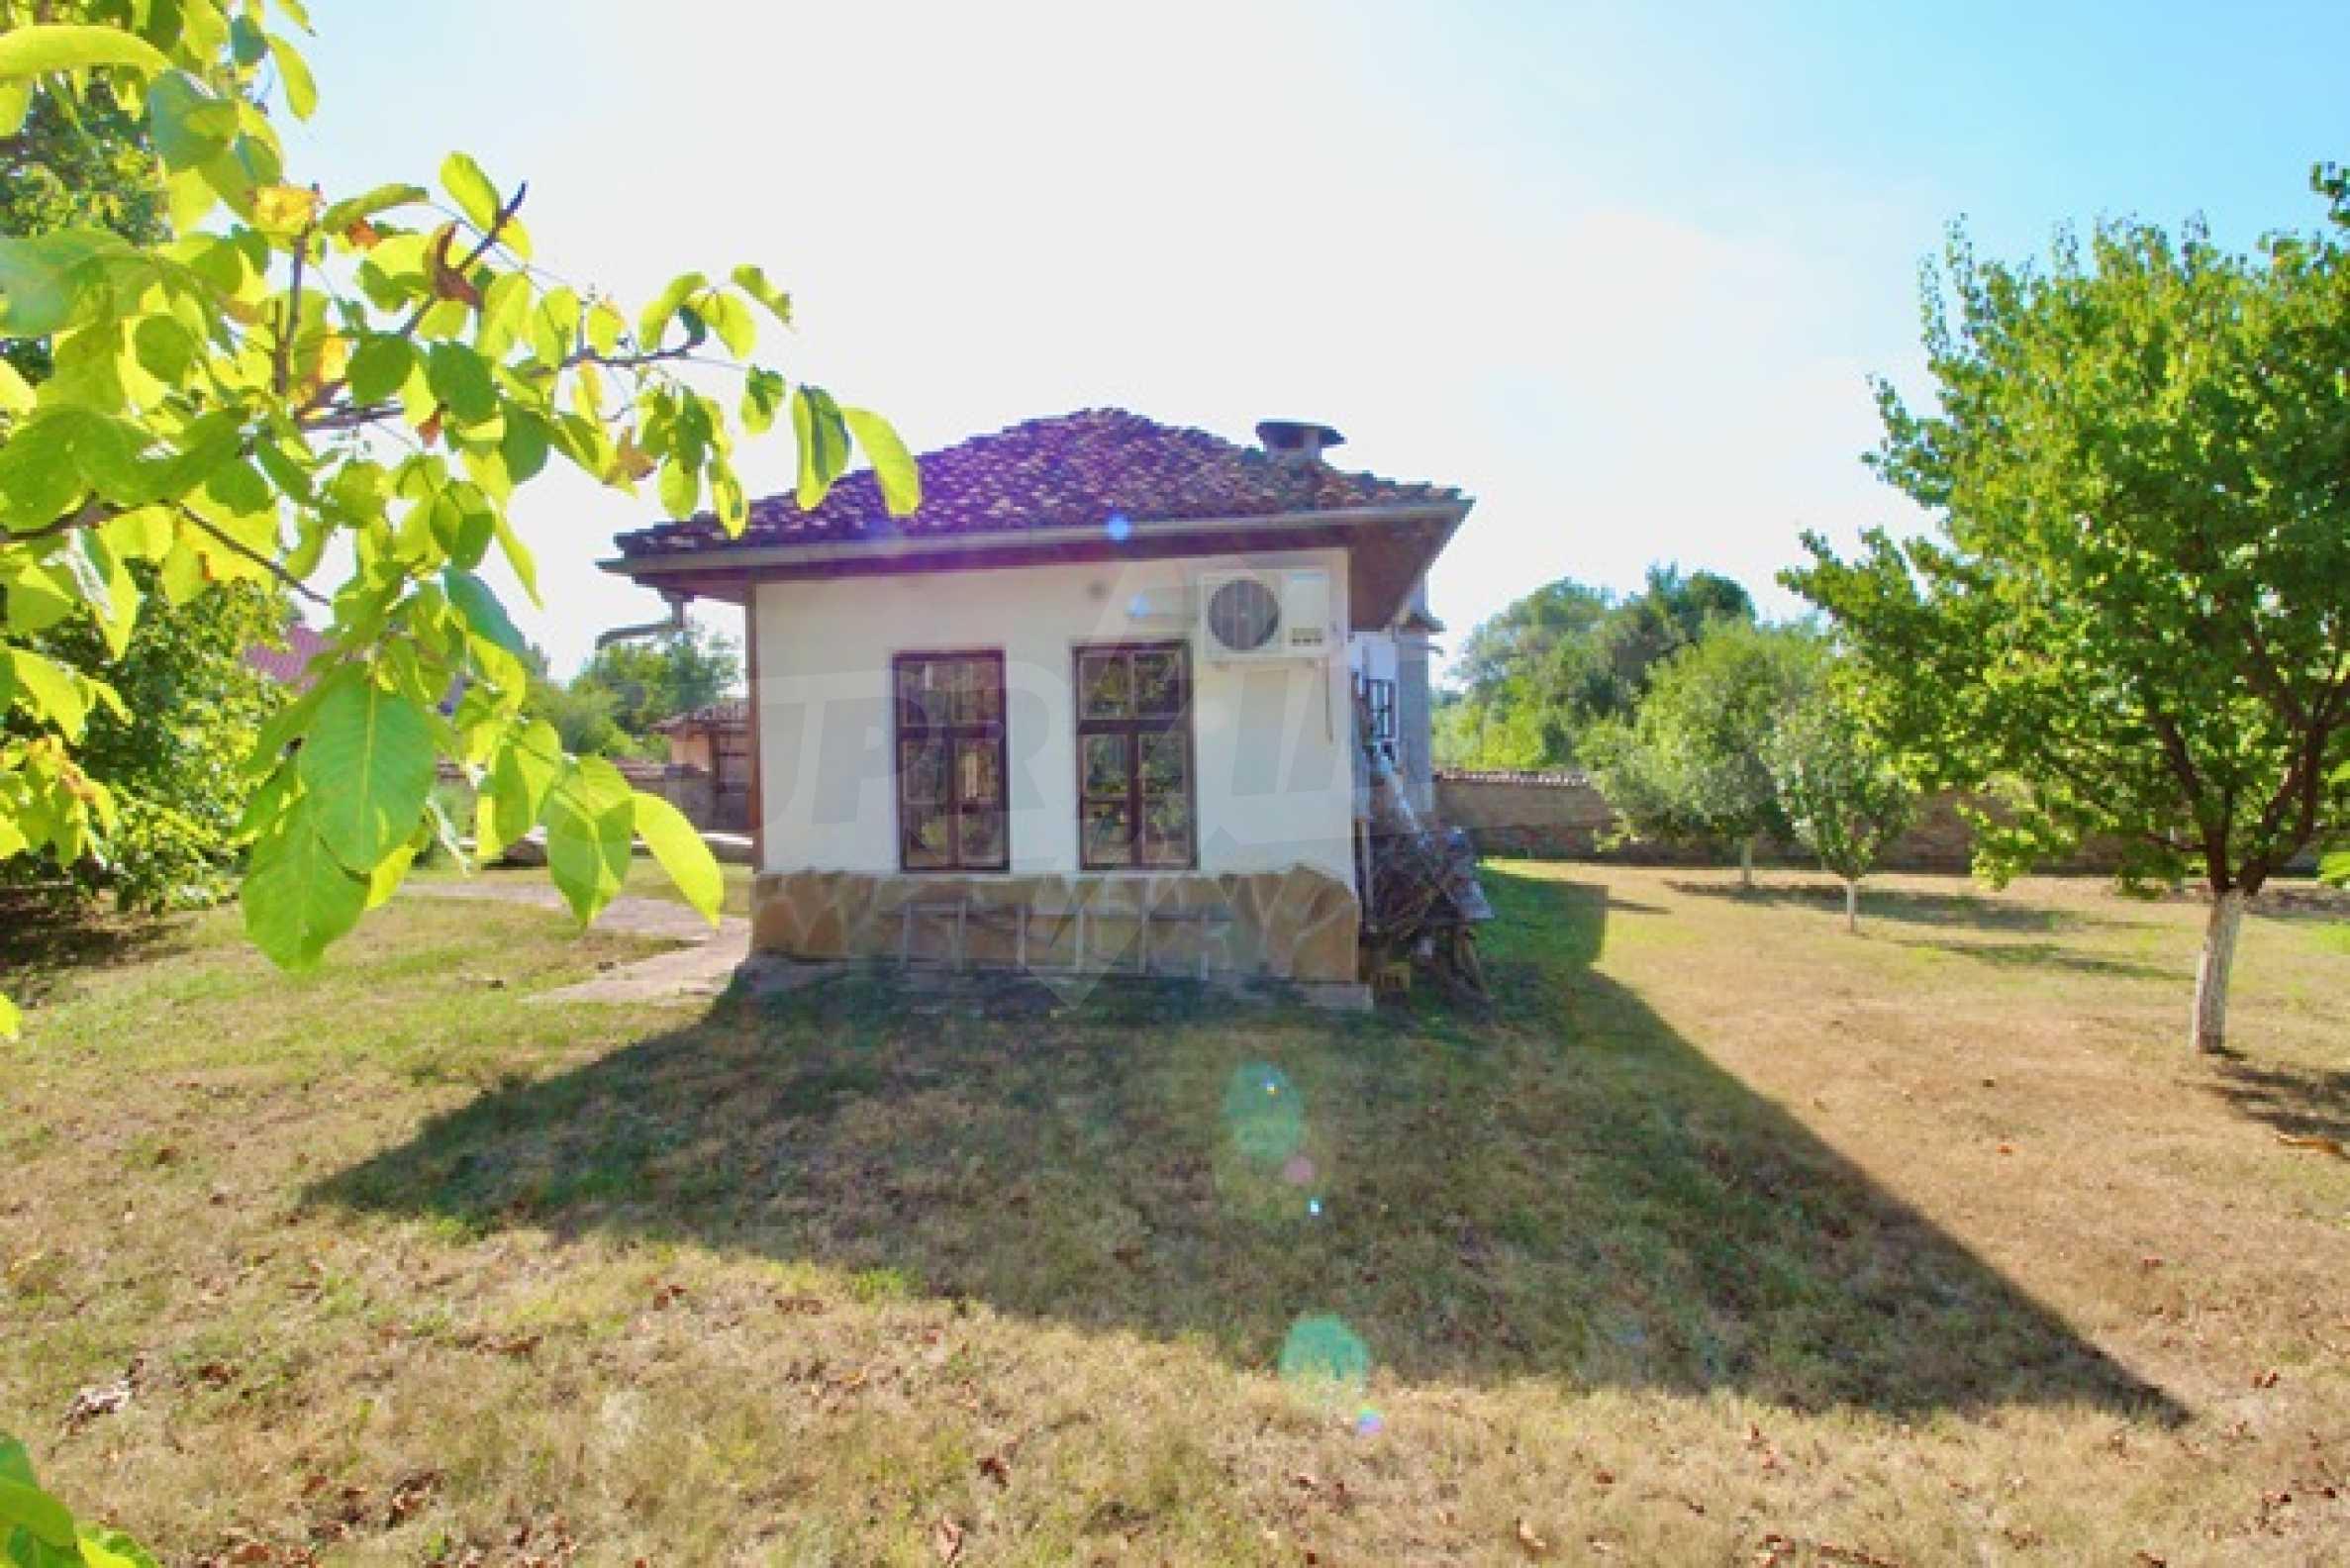 Lovely old house just 17 km away from Veliko Tarnovo 23